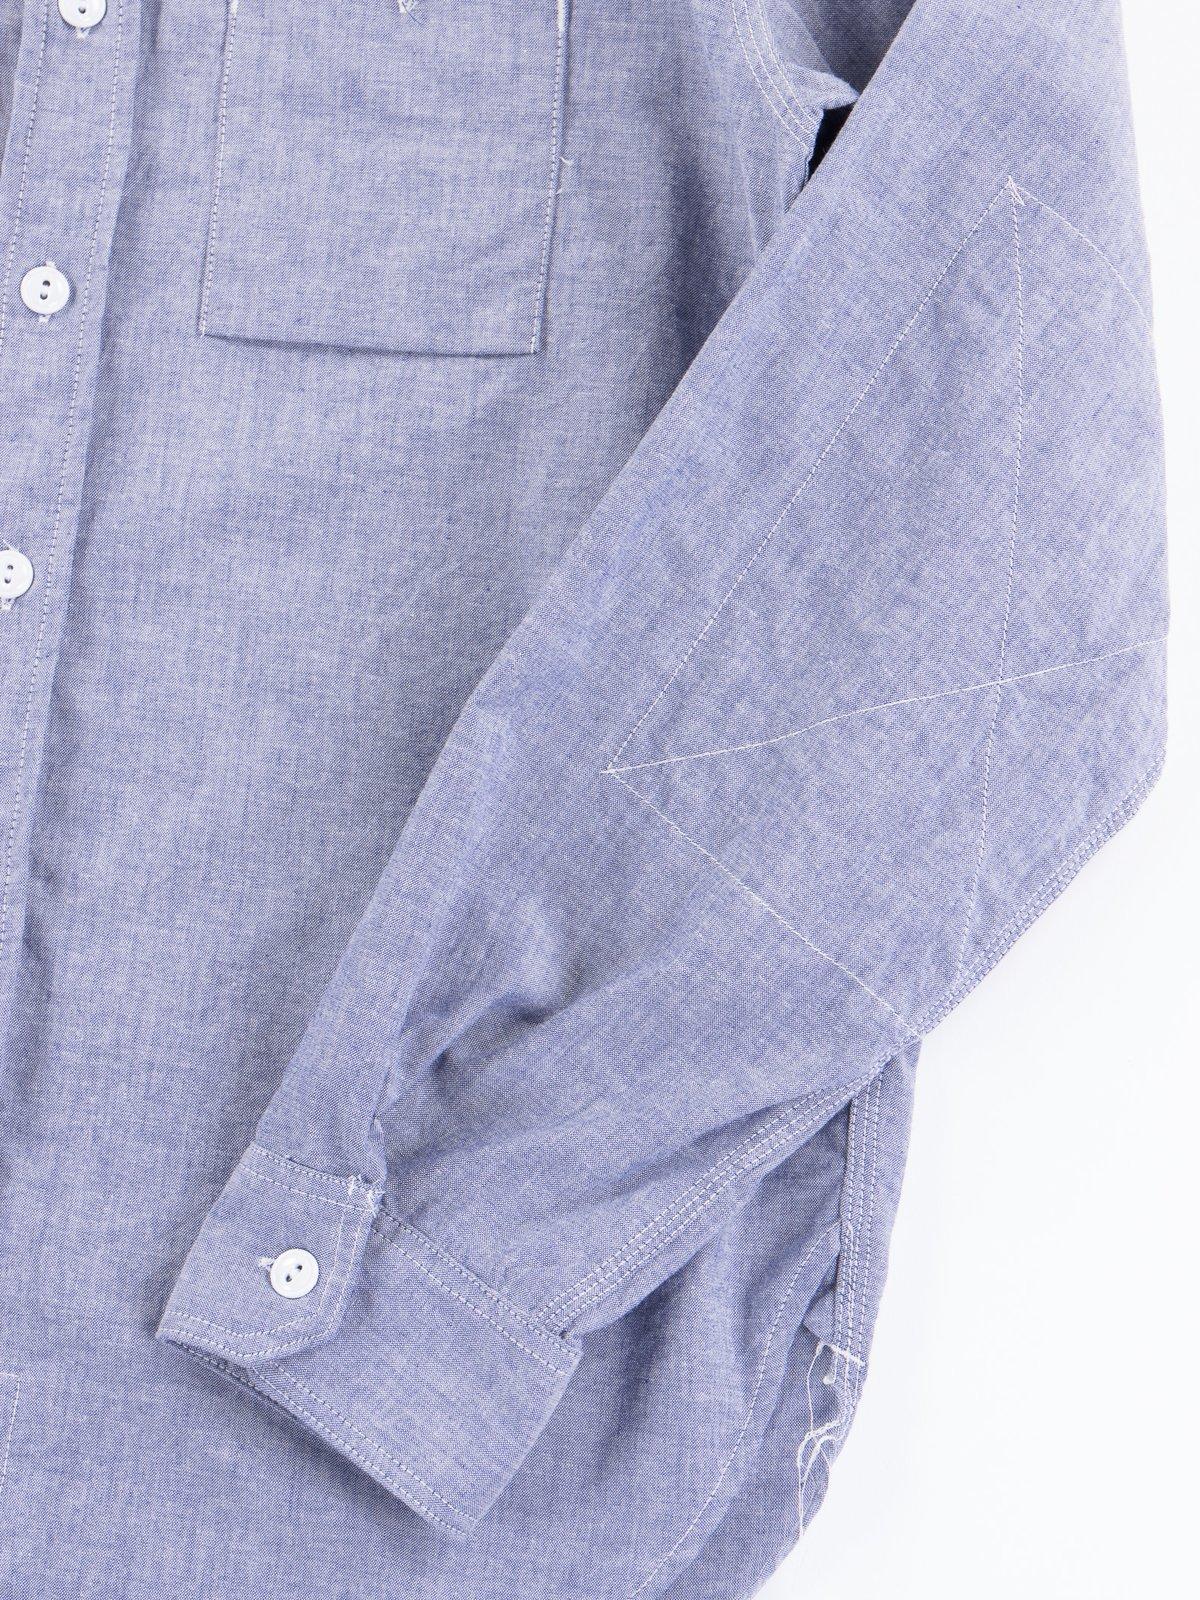 Light Blue Light Weight Cotton Chambray Work Shirt - Image 3